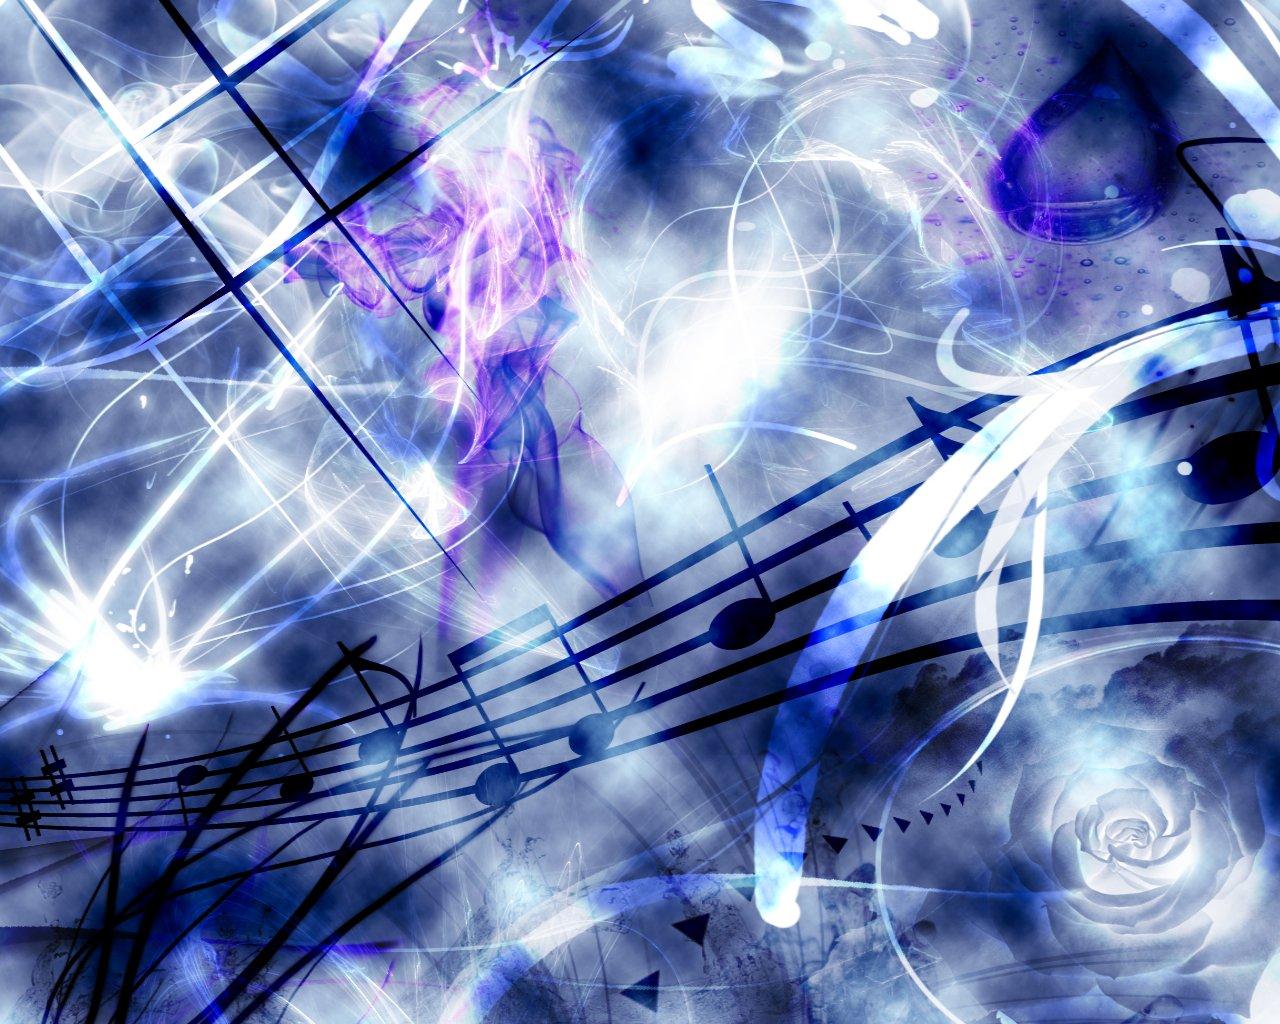 Music Abstract Backgrounds Wallpapersafari